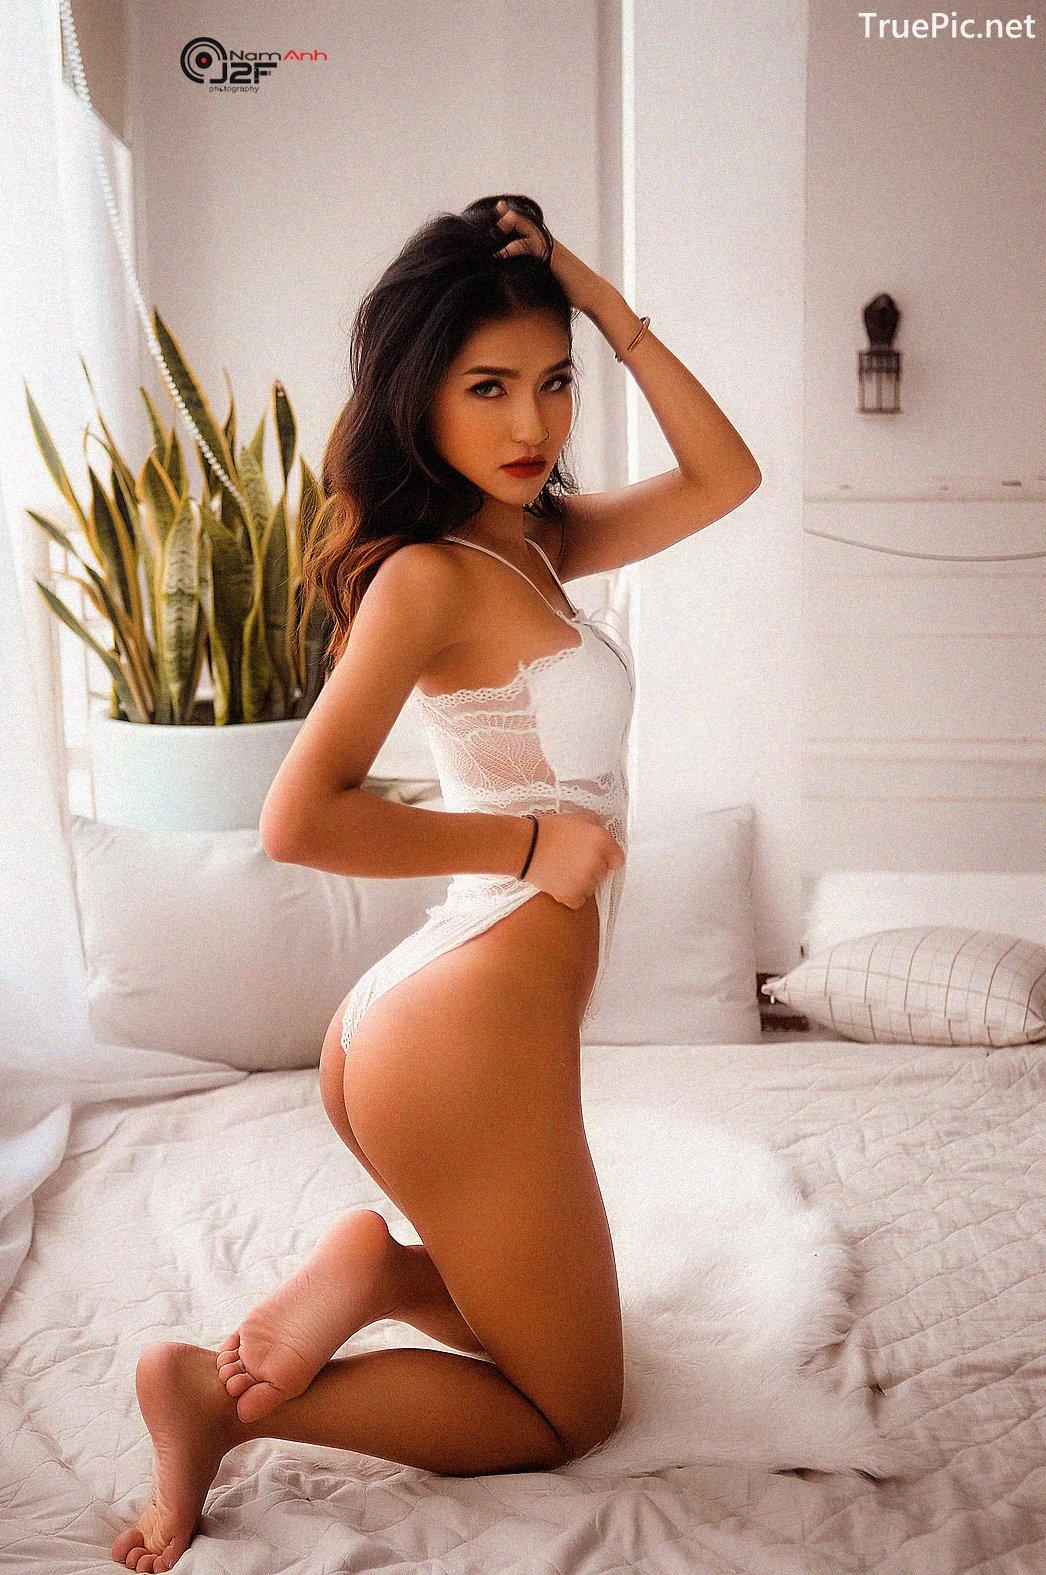 Image Vietnamese Model – Sexy Beauty of Beautiful Girls Taken by NamAnh Photo #7 - TruePic.net - Picture-38